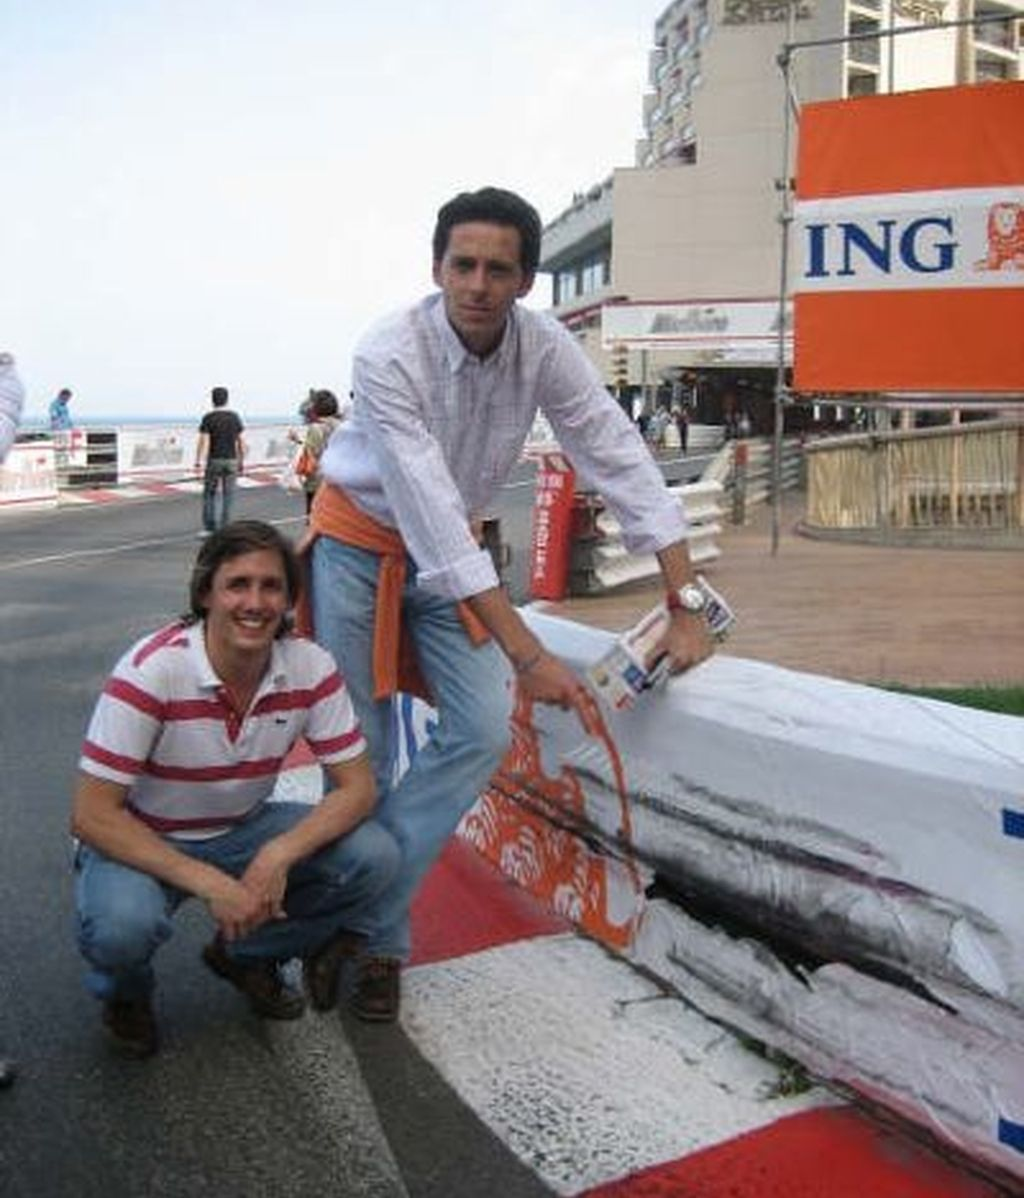 Mónaco 2007